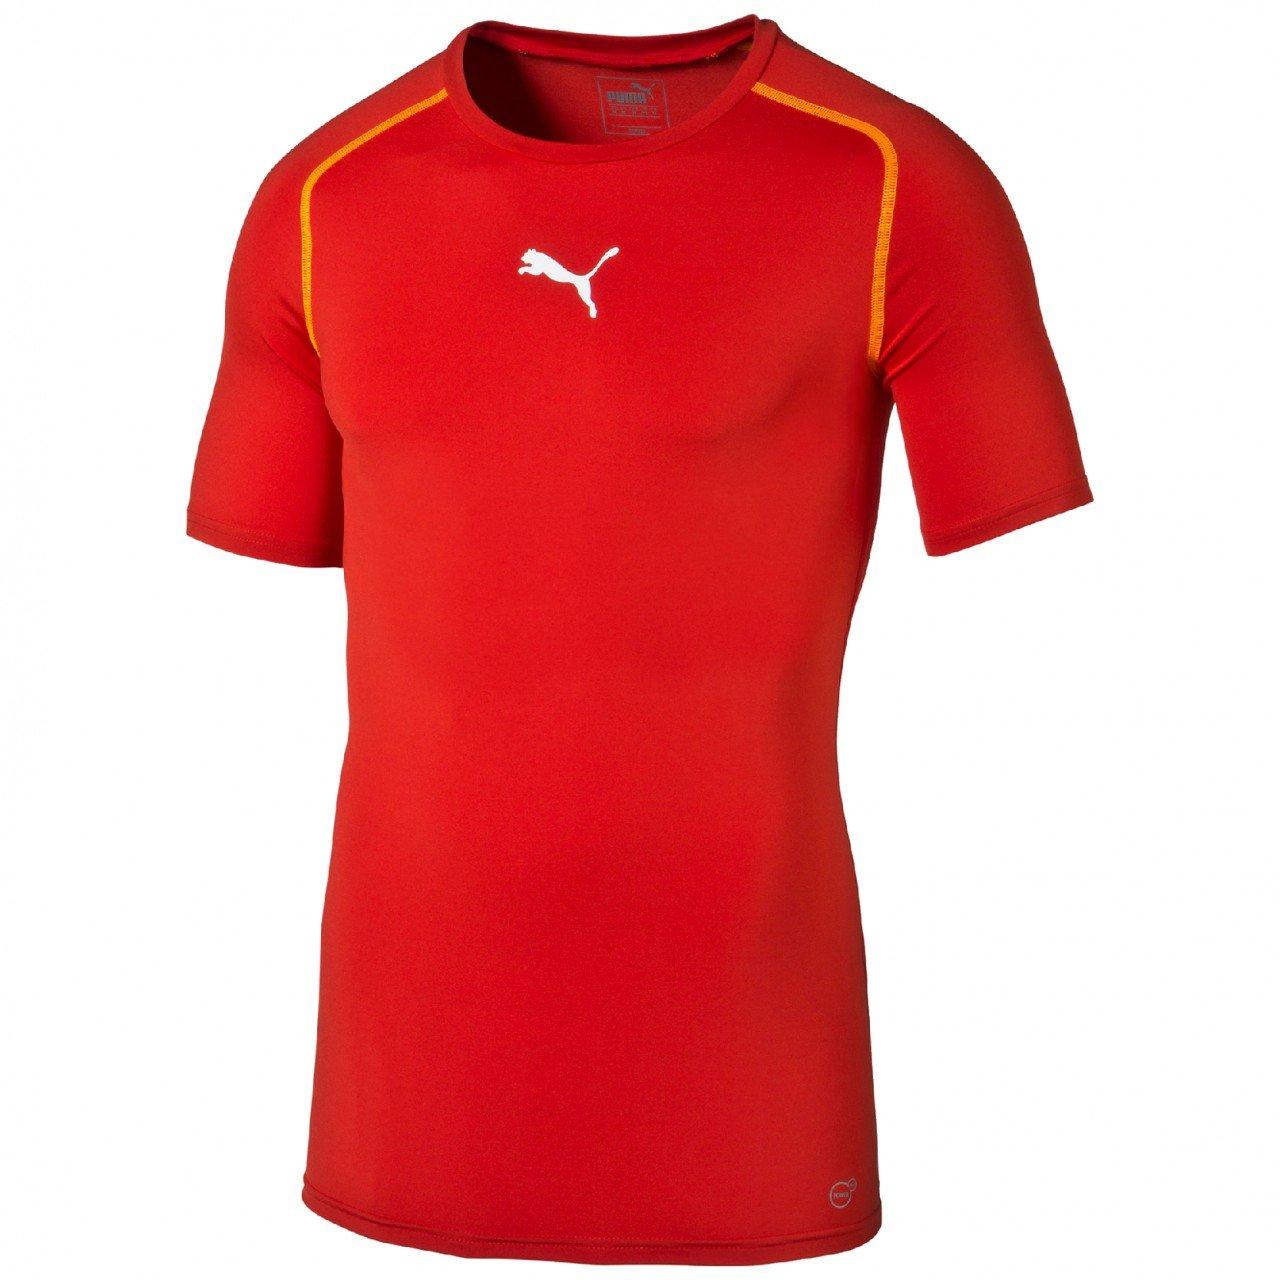 PUMA Herren T-shirt TB Short Sleeve Tee 654613396